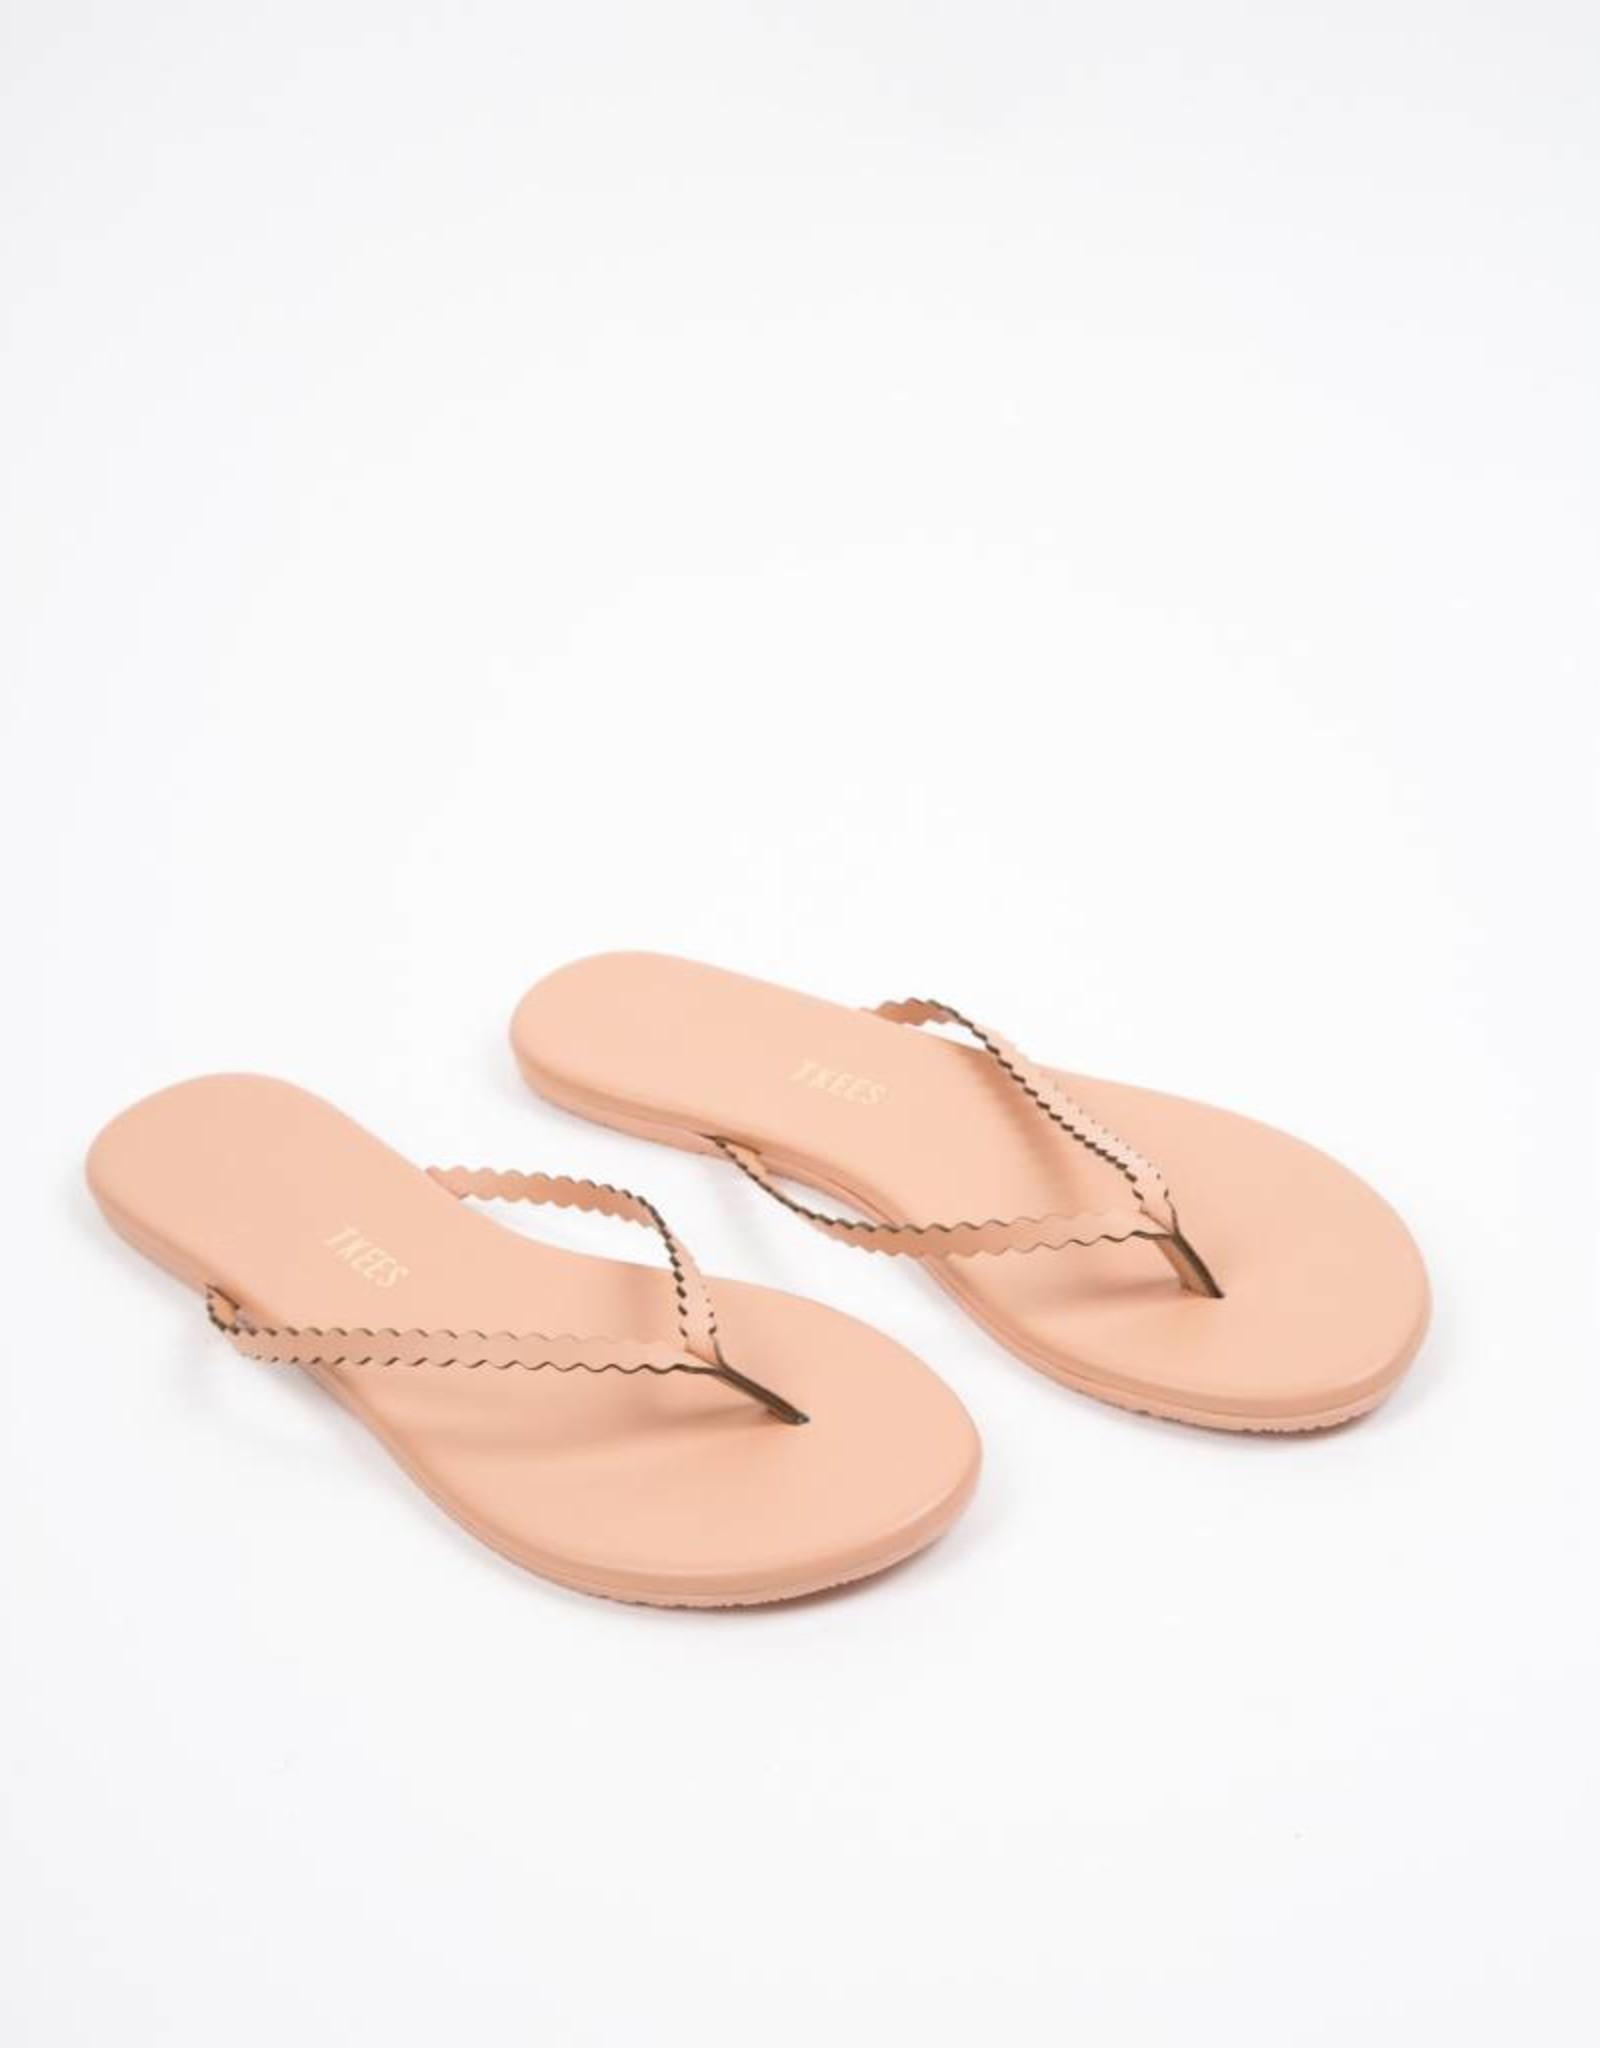 Tkees Studio Scalloped Sophie Nude Sandals